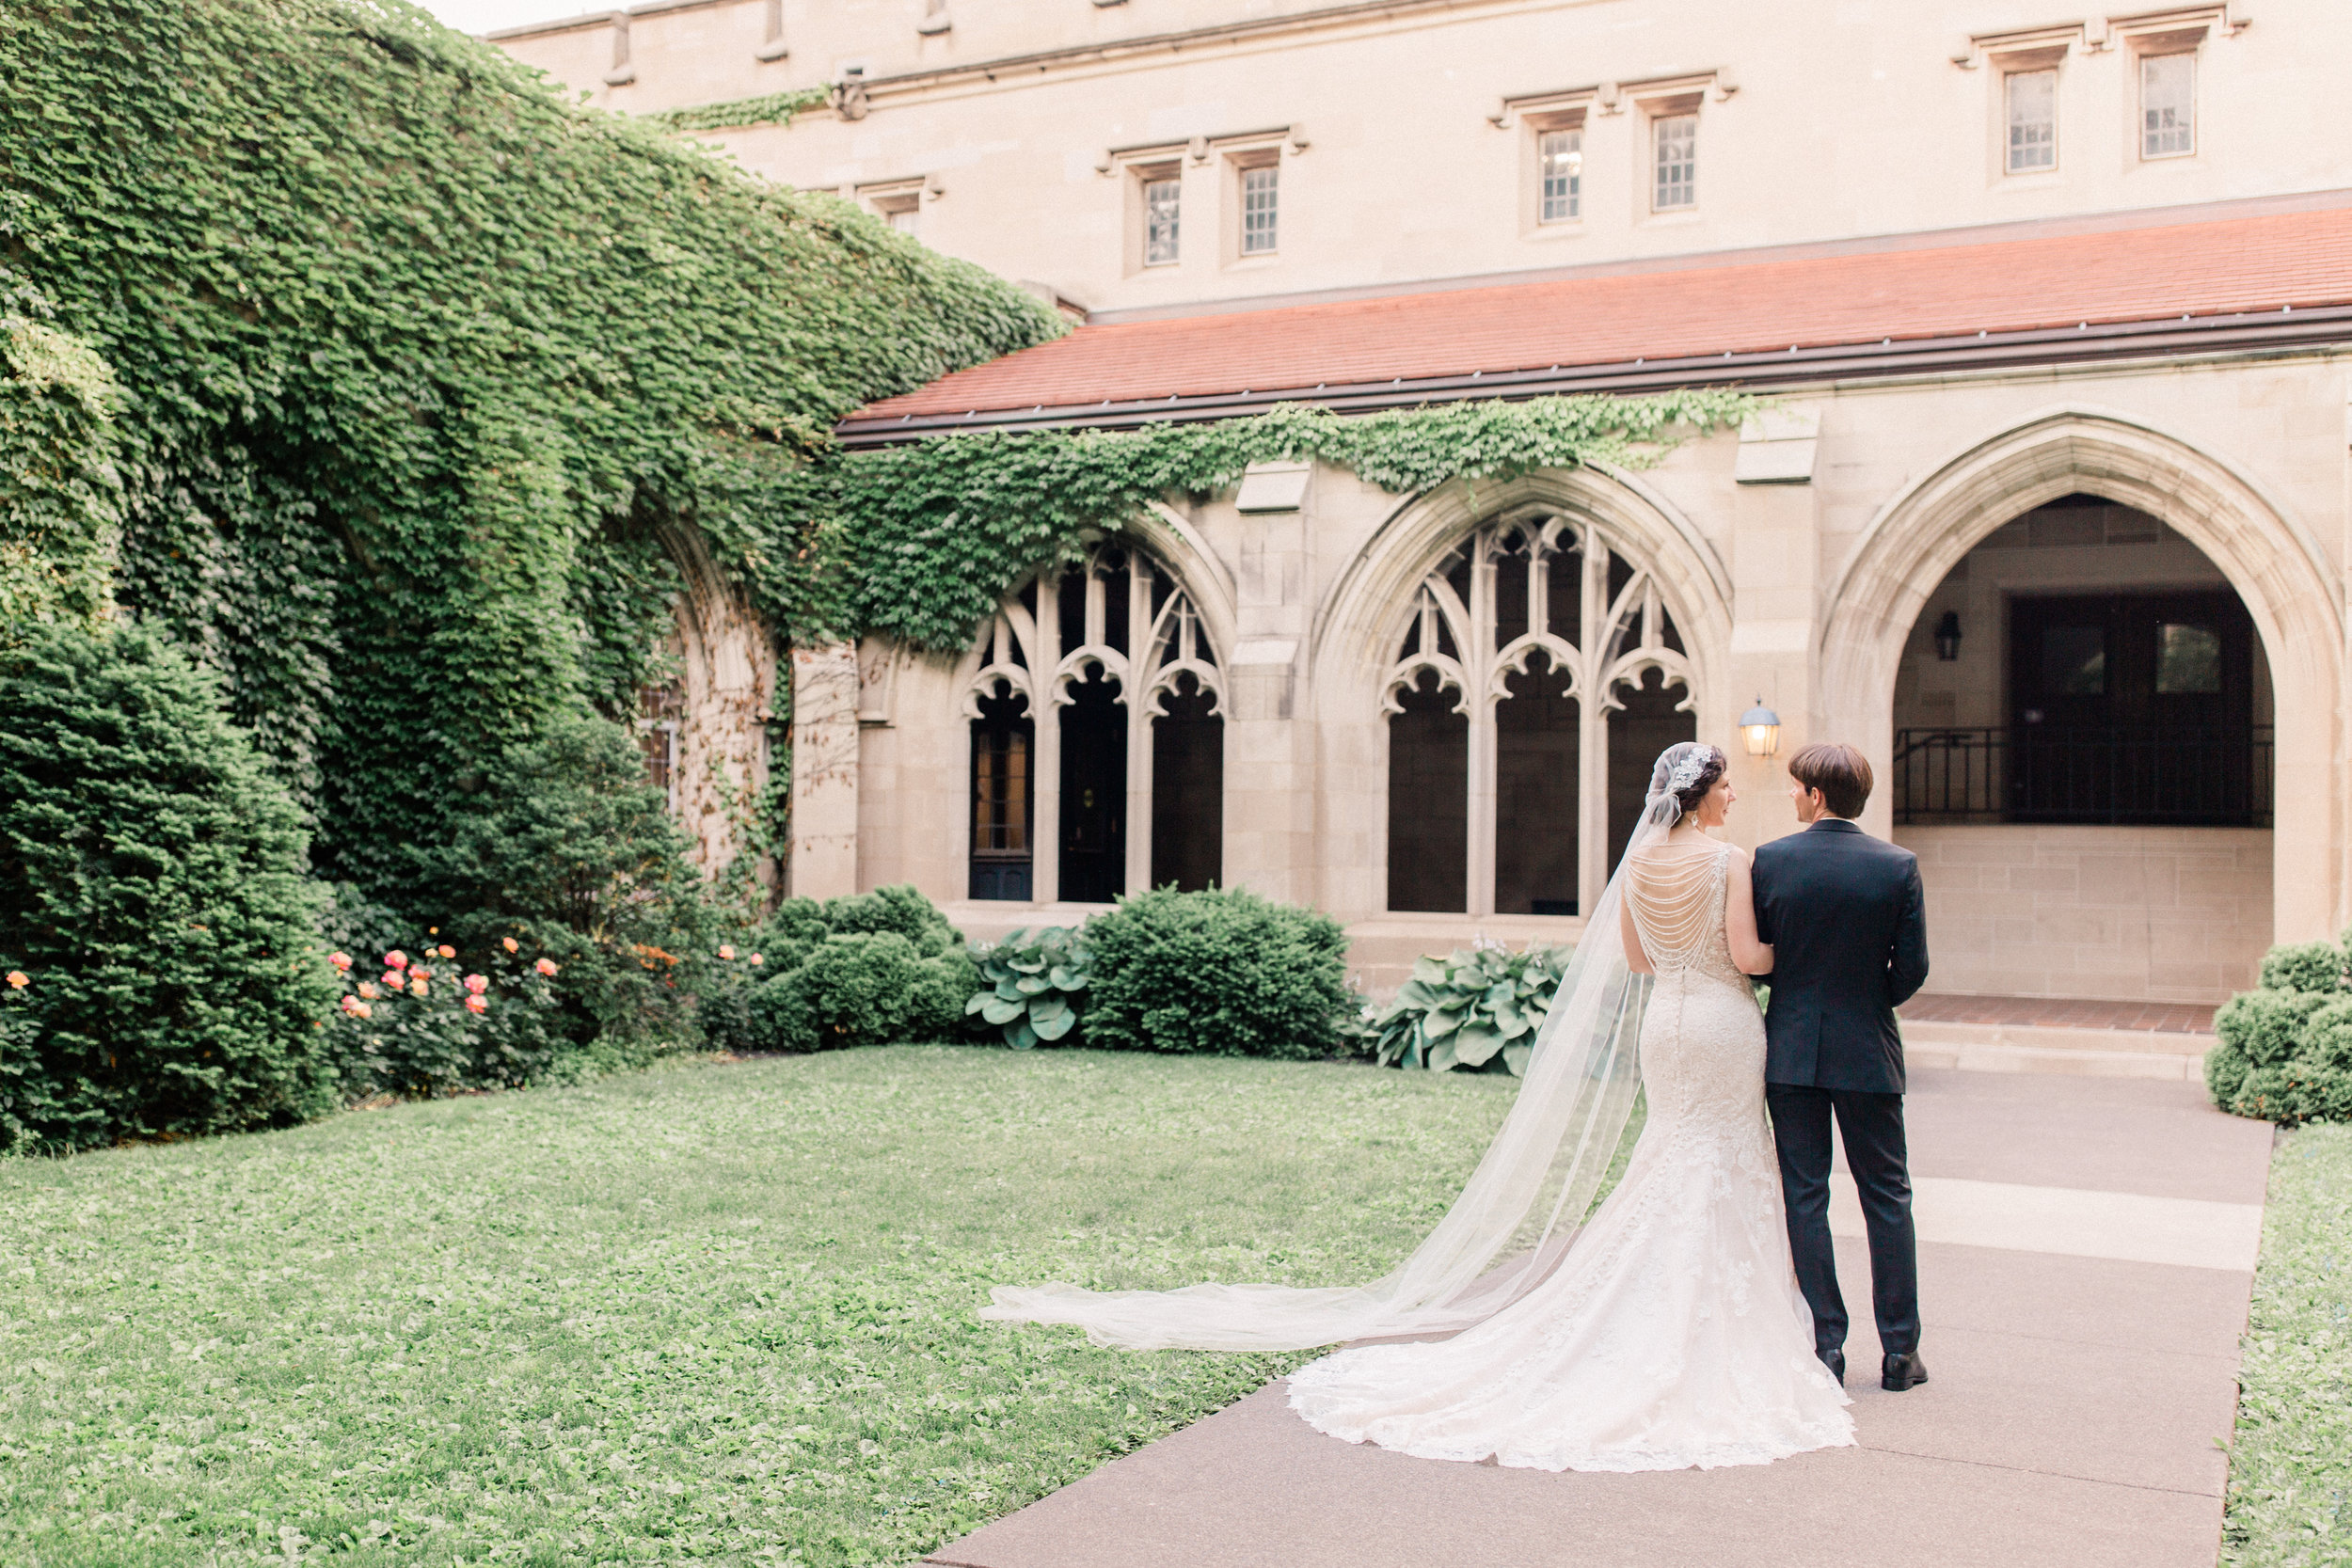 Dorothy_Louise_Photography_University_of_Chicago_Chapel_Wedding-80.jpg